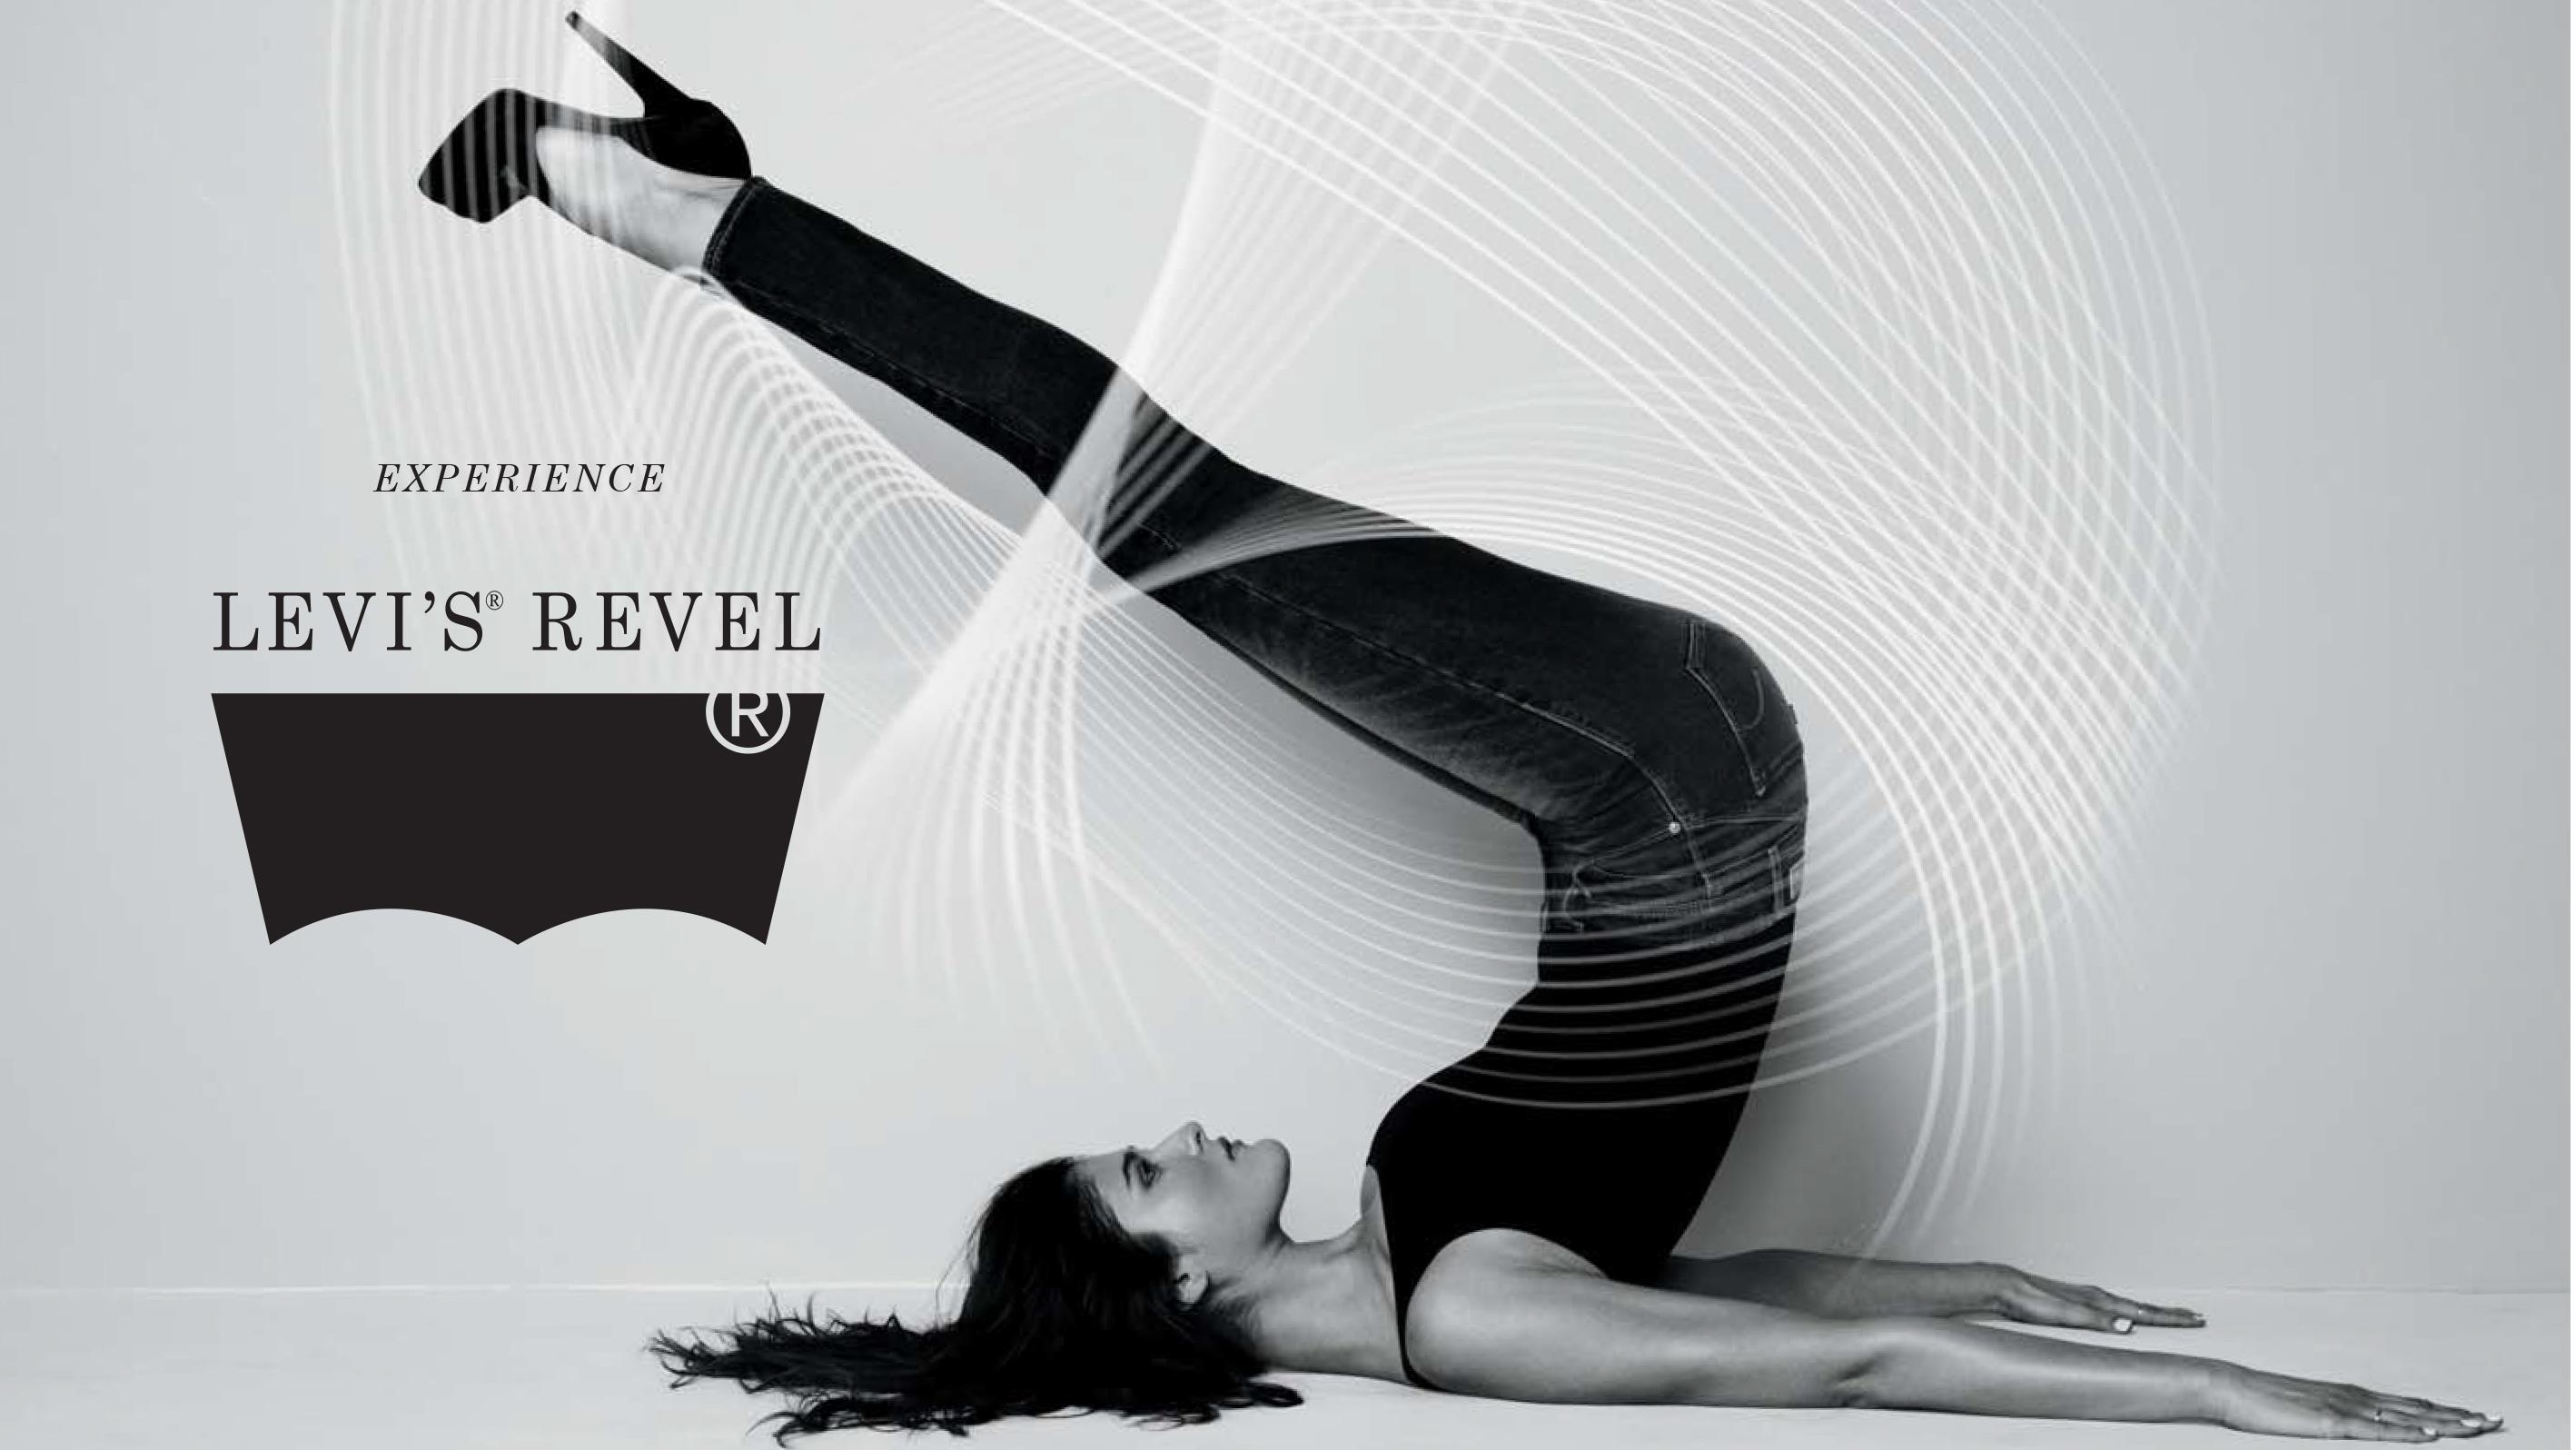 Levi's Revel: Bringing Heroine to Heritage